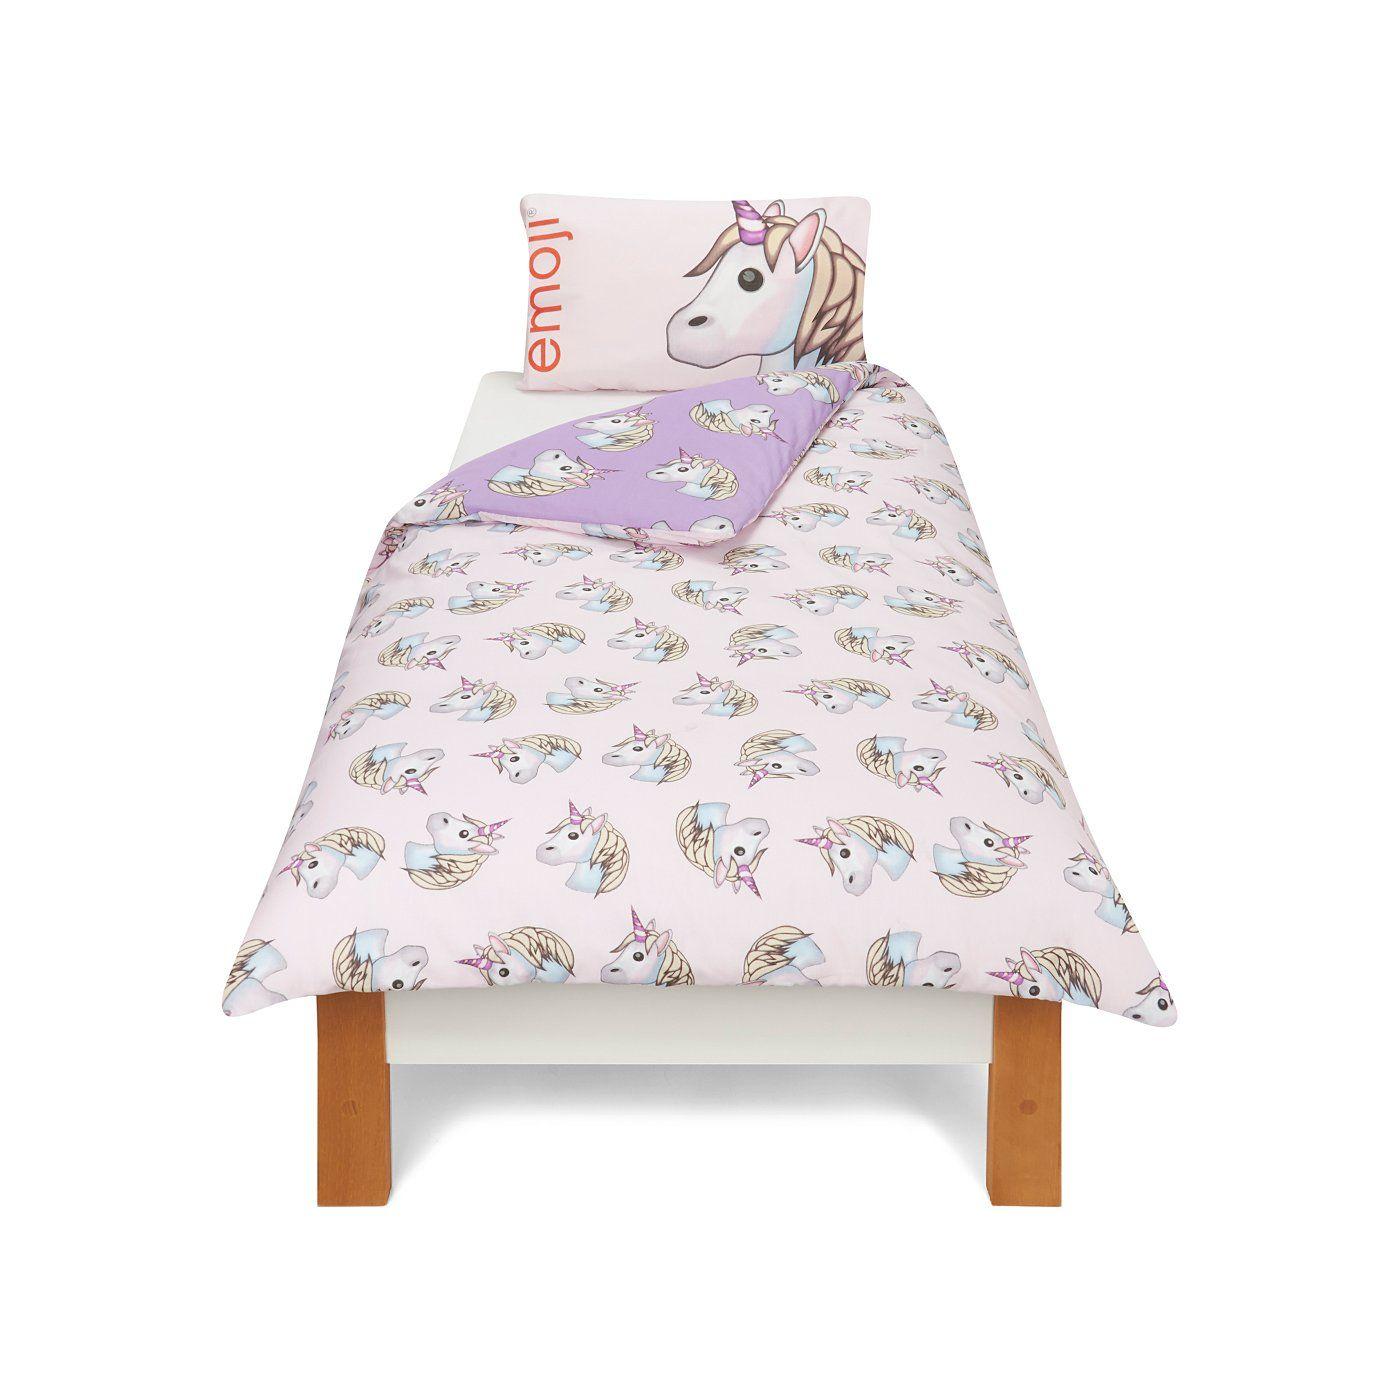 Buy Emoji Unicorn Bedding Range from our Bedding range